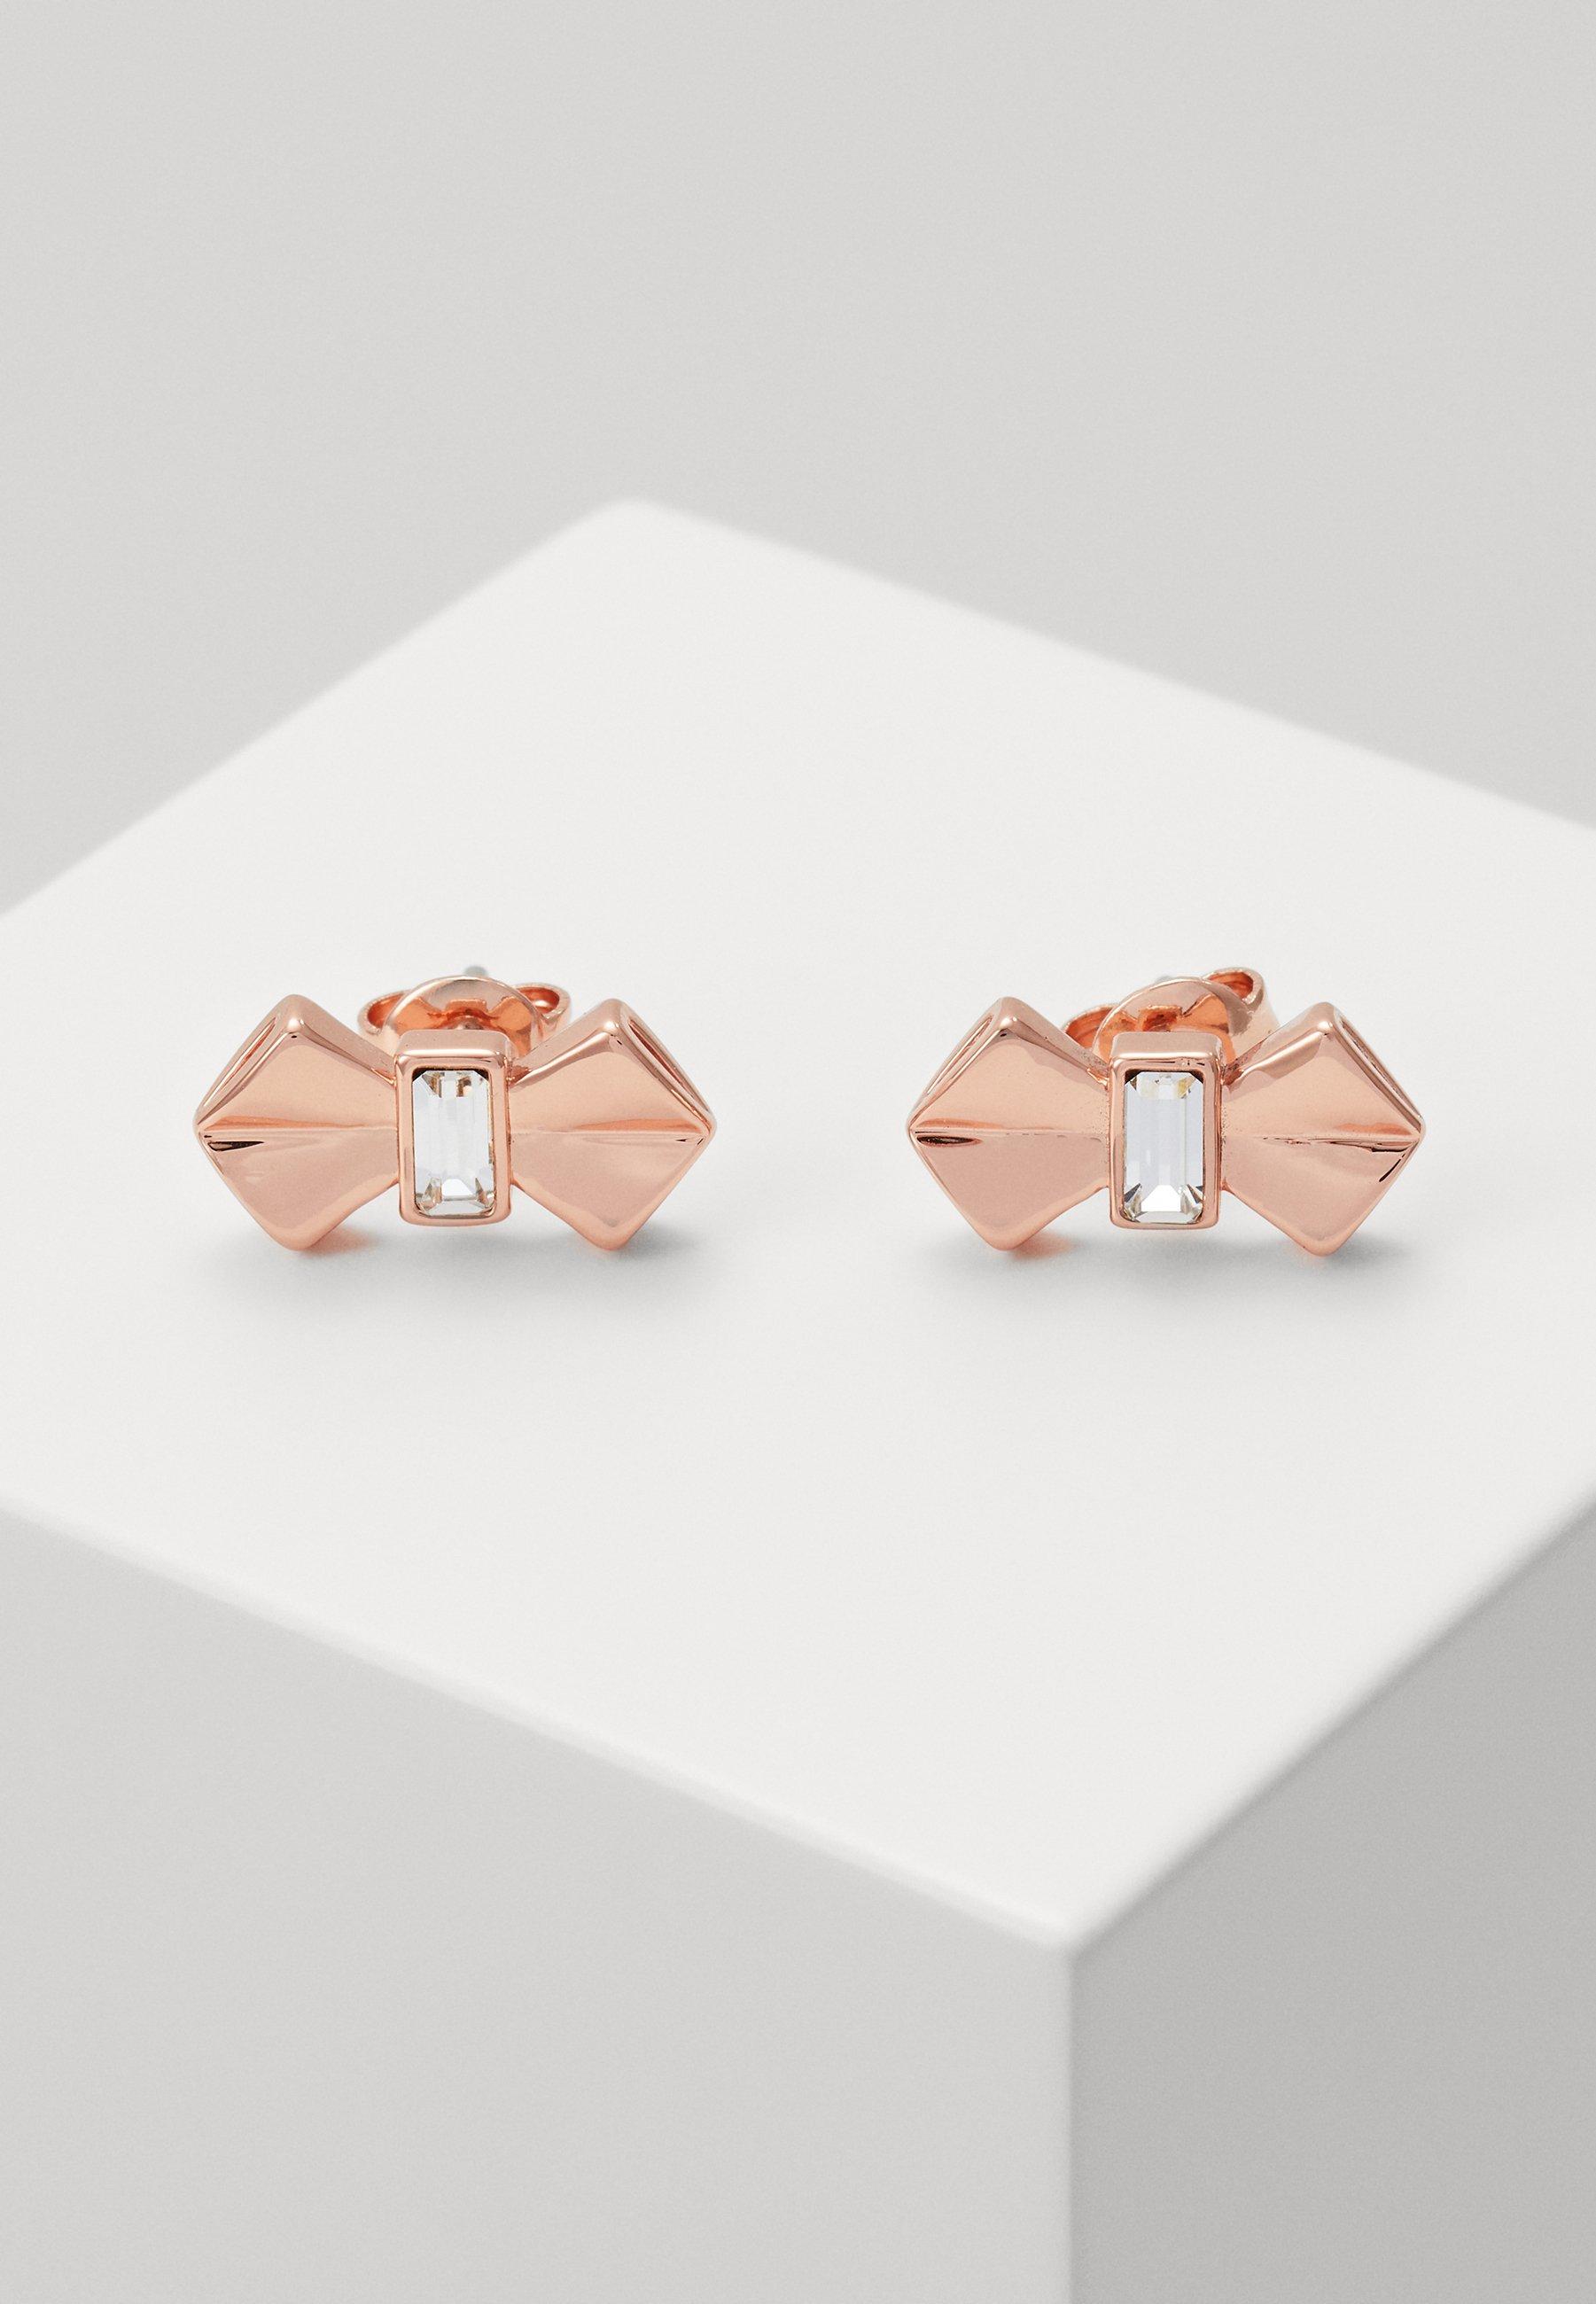 Ted Baker Susli Bow Stud Earring Earrings Rose Gold Coloured Zalando Co Uk